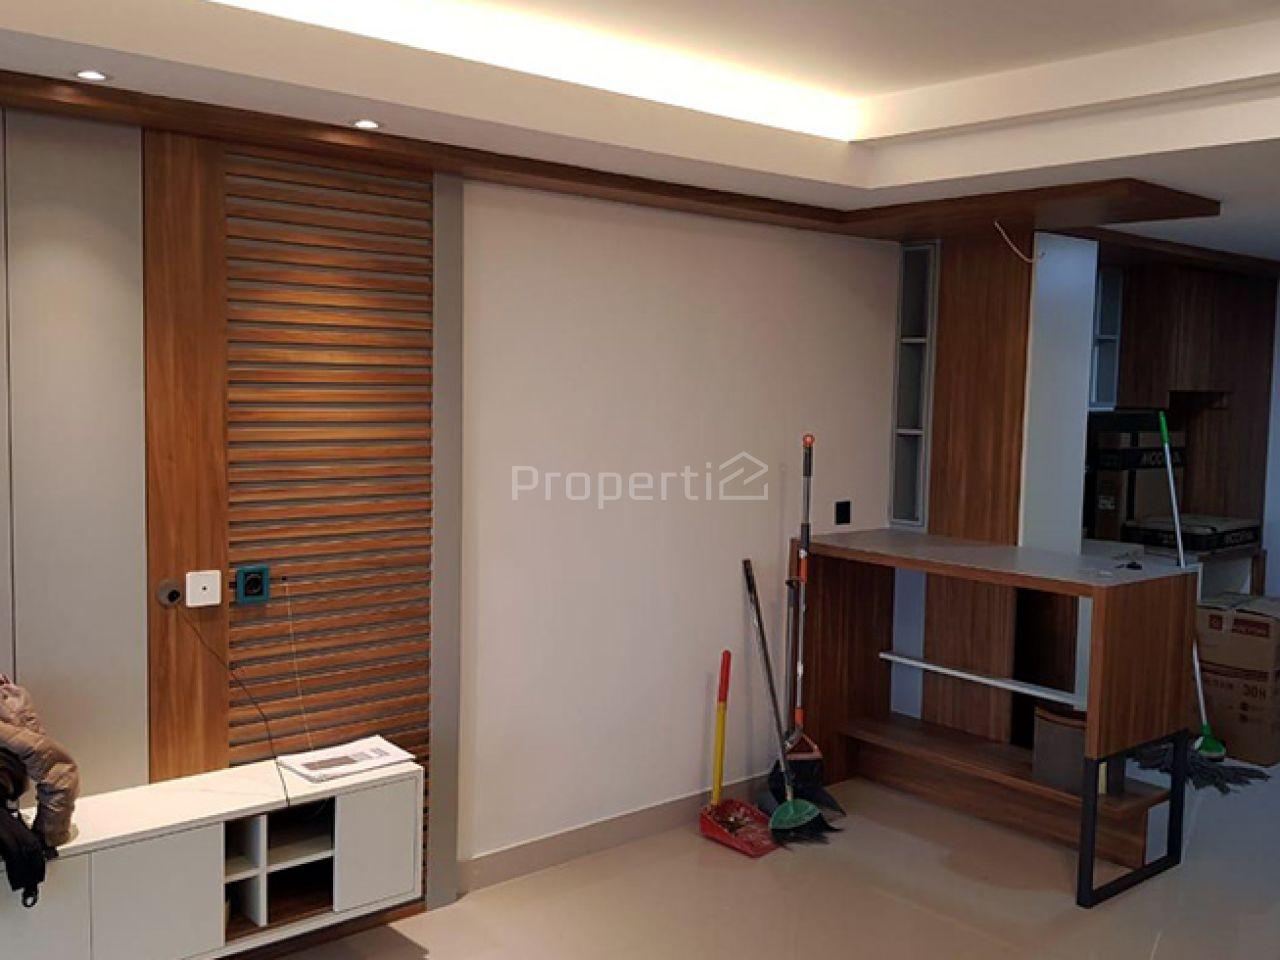 Studio Apartment Unit at Tamansari Tera Residence, 17th Floor, Jawa Barat